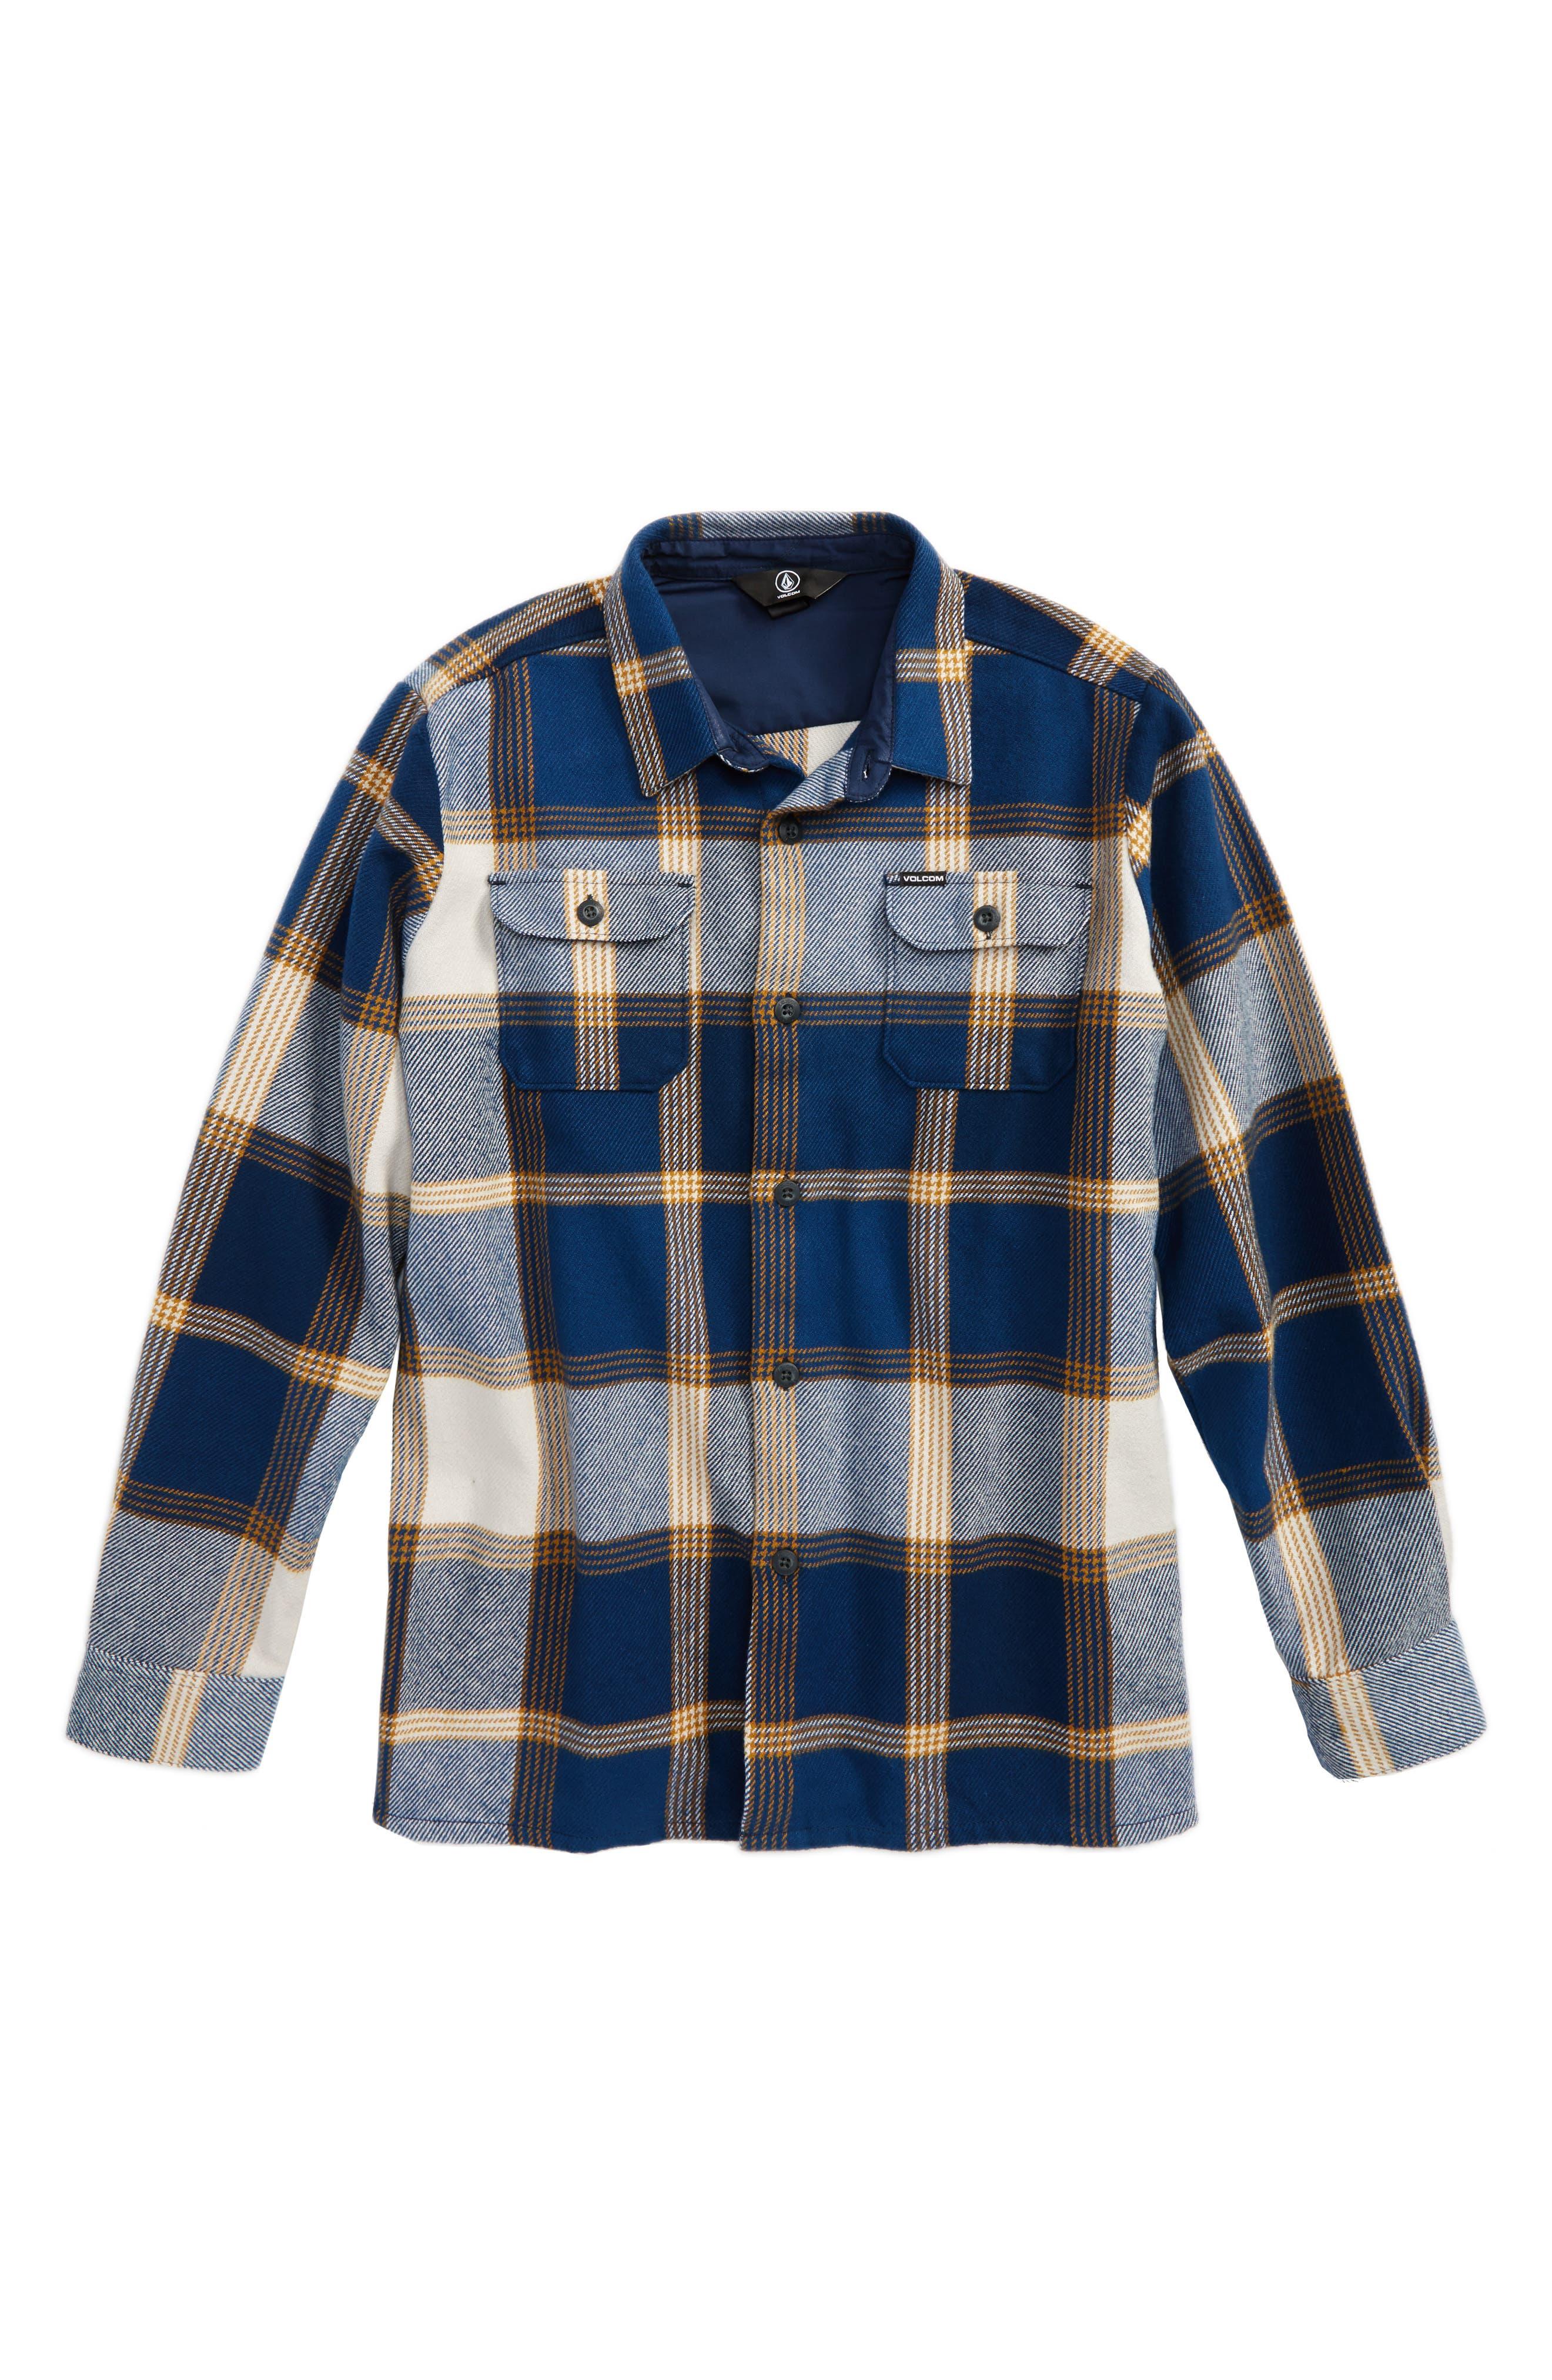 Main Image - Volcom Heavy Daze Plaid Flannel Shirt Jacket (Big Boys)